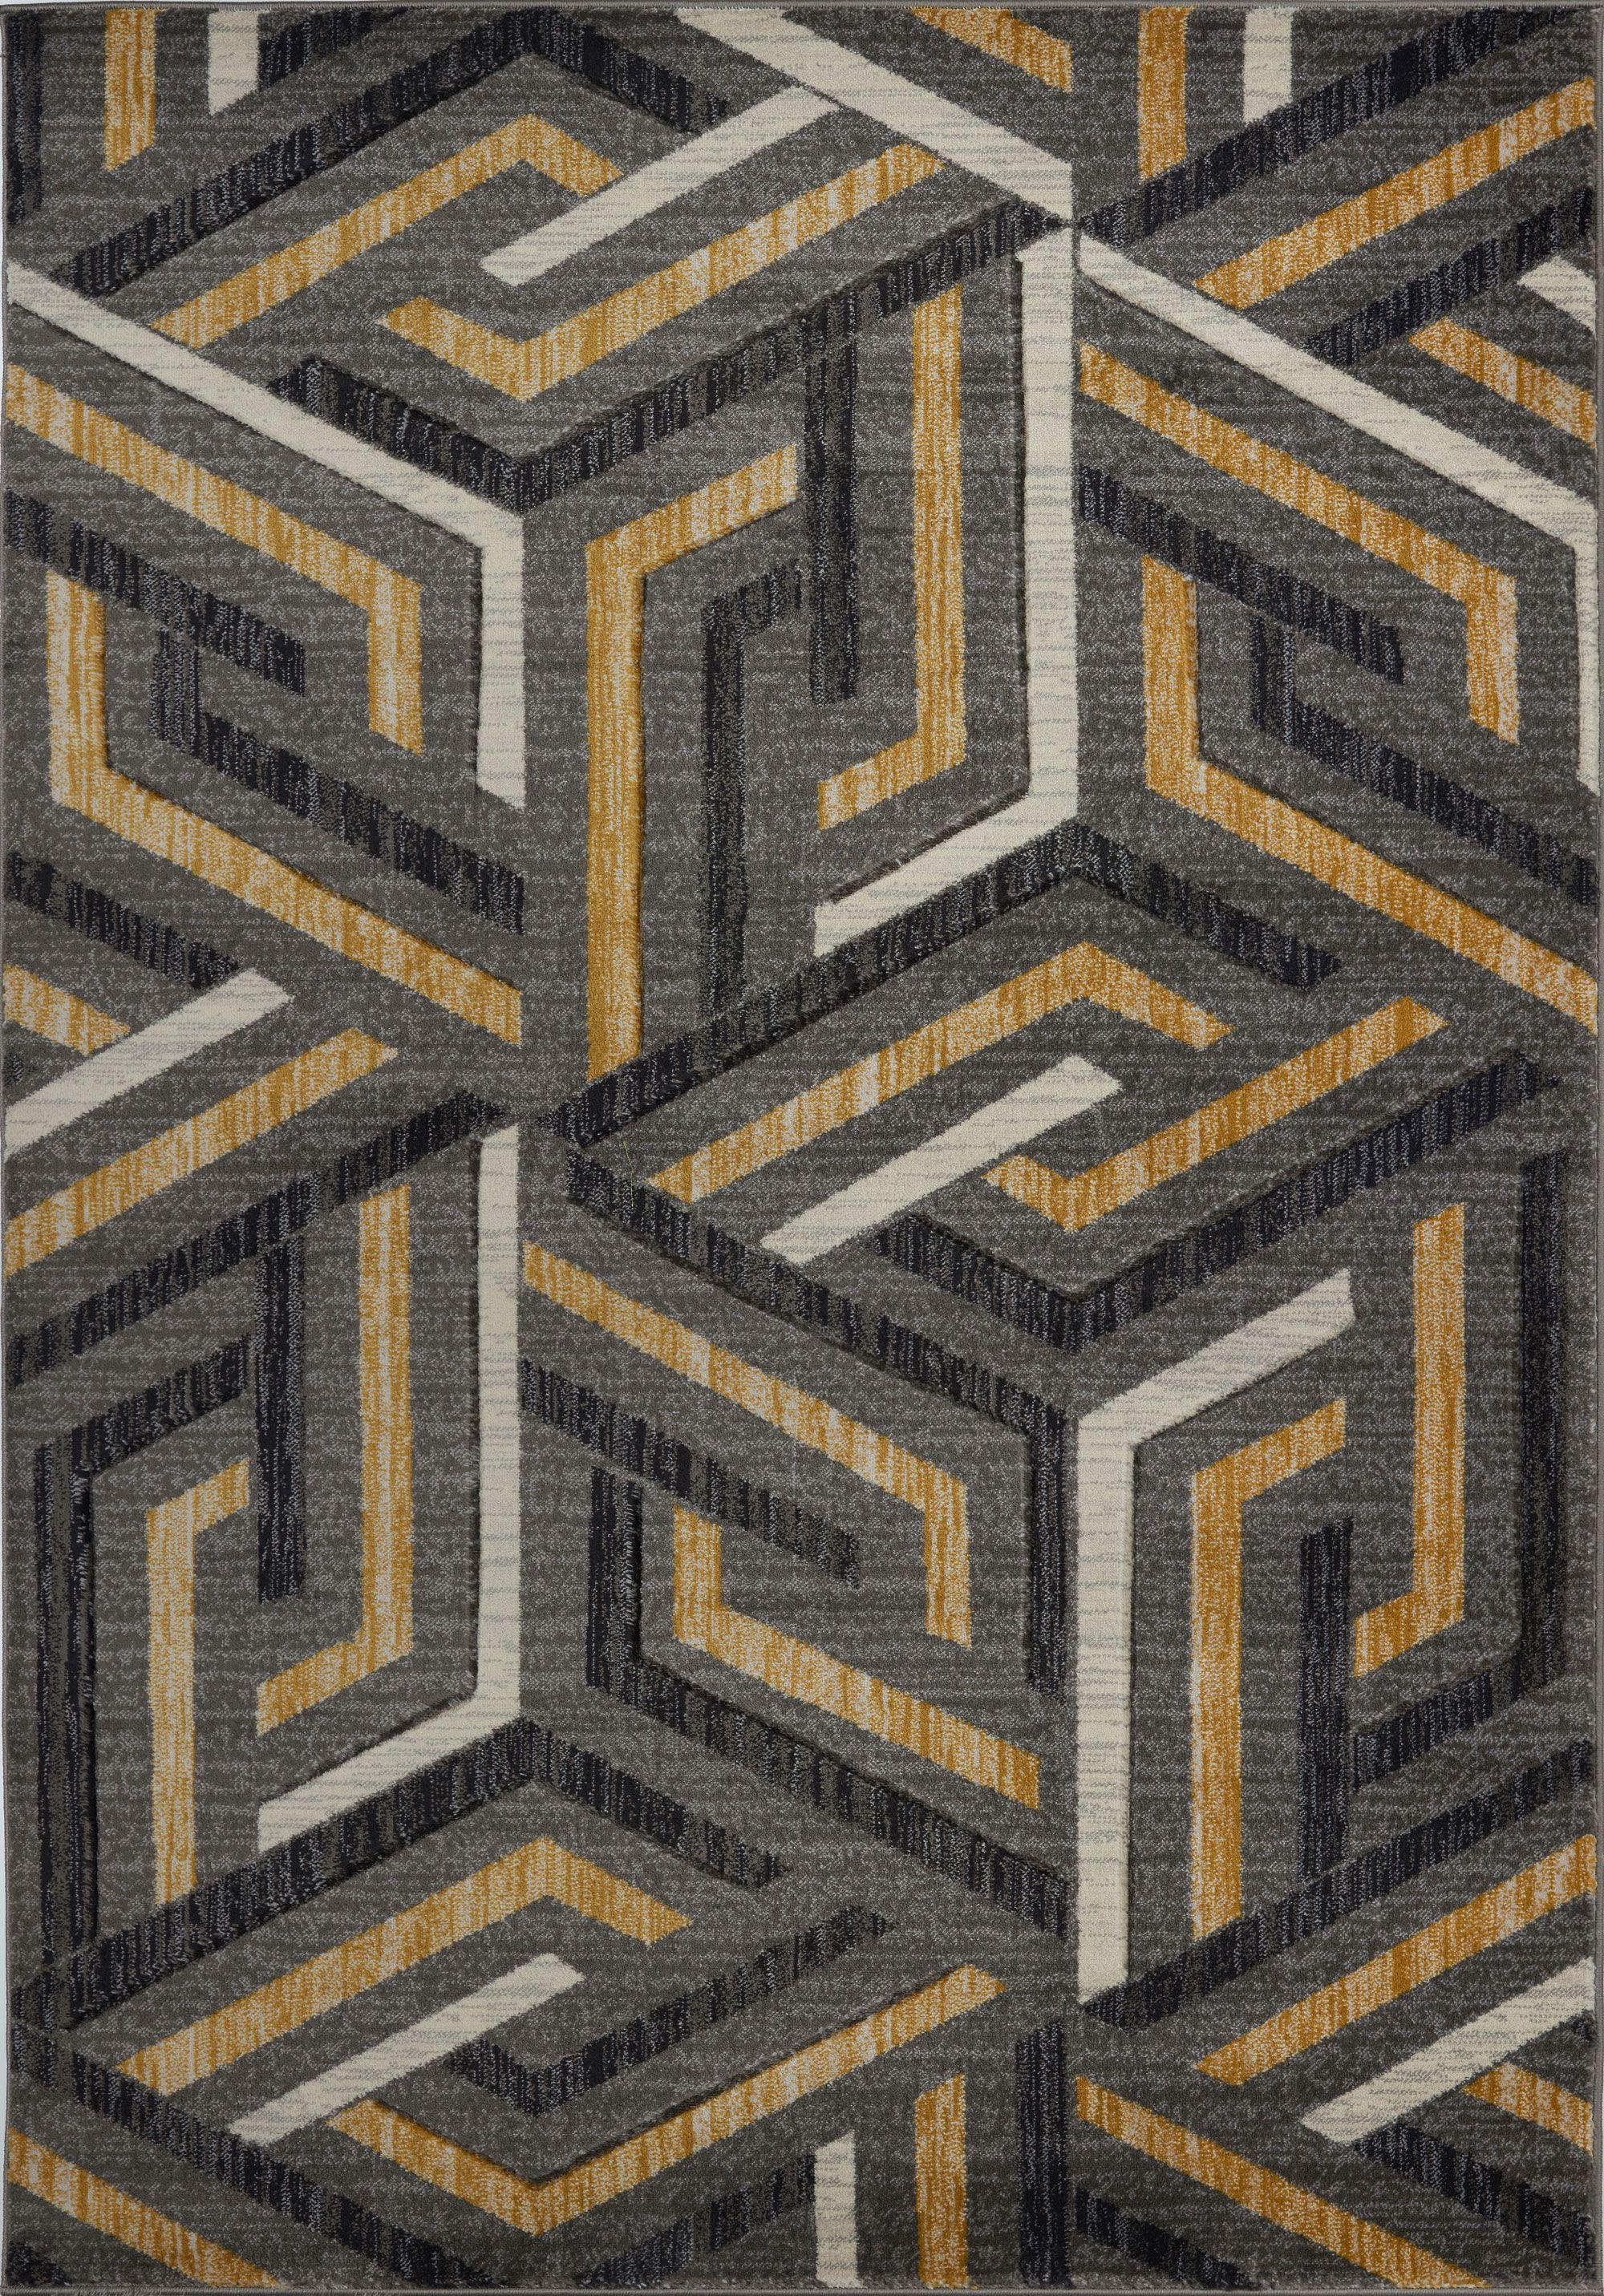 Lynn Valley Grey Gold Area Rug Gold Grey Honeycomb Hexagon